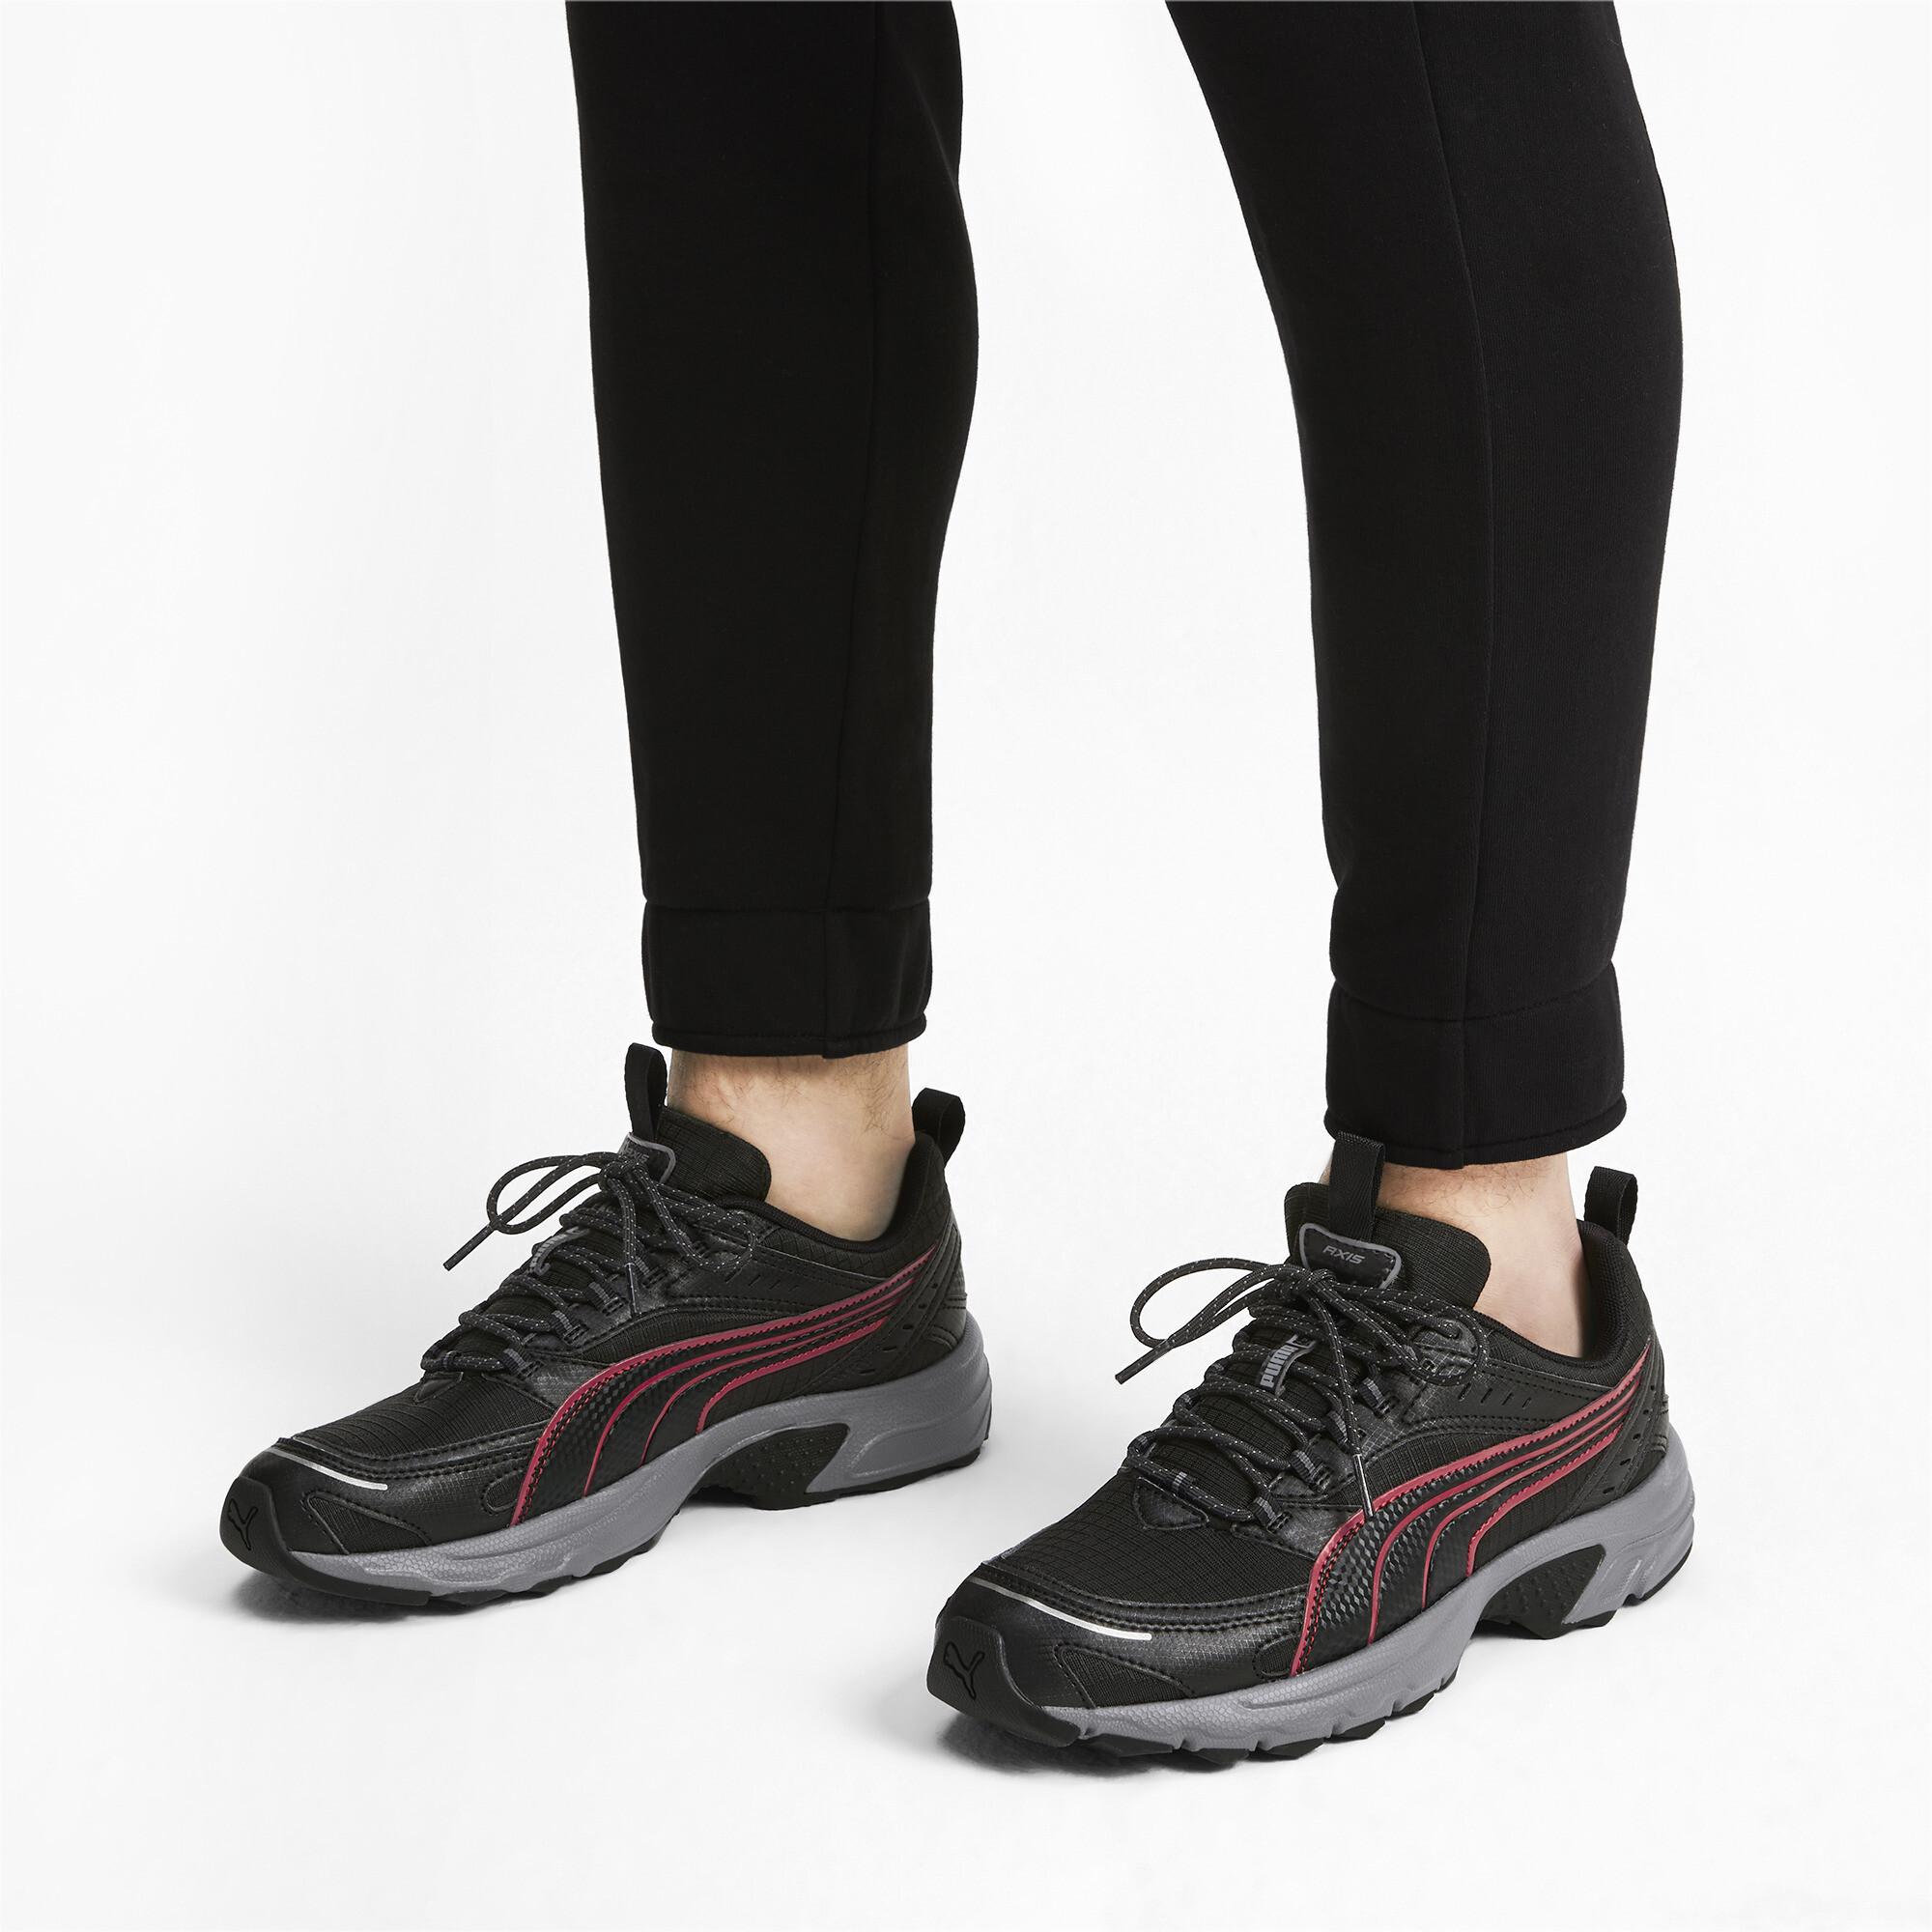 PUMA-Axis-Trail-Sneakers-Men-Shoe-Basics miniature 12